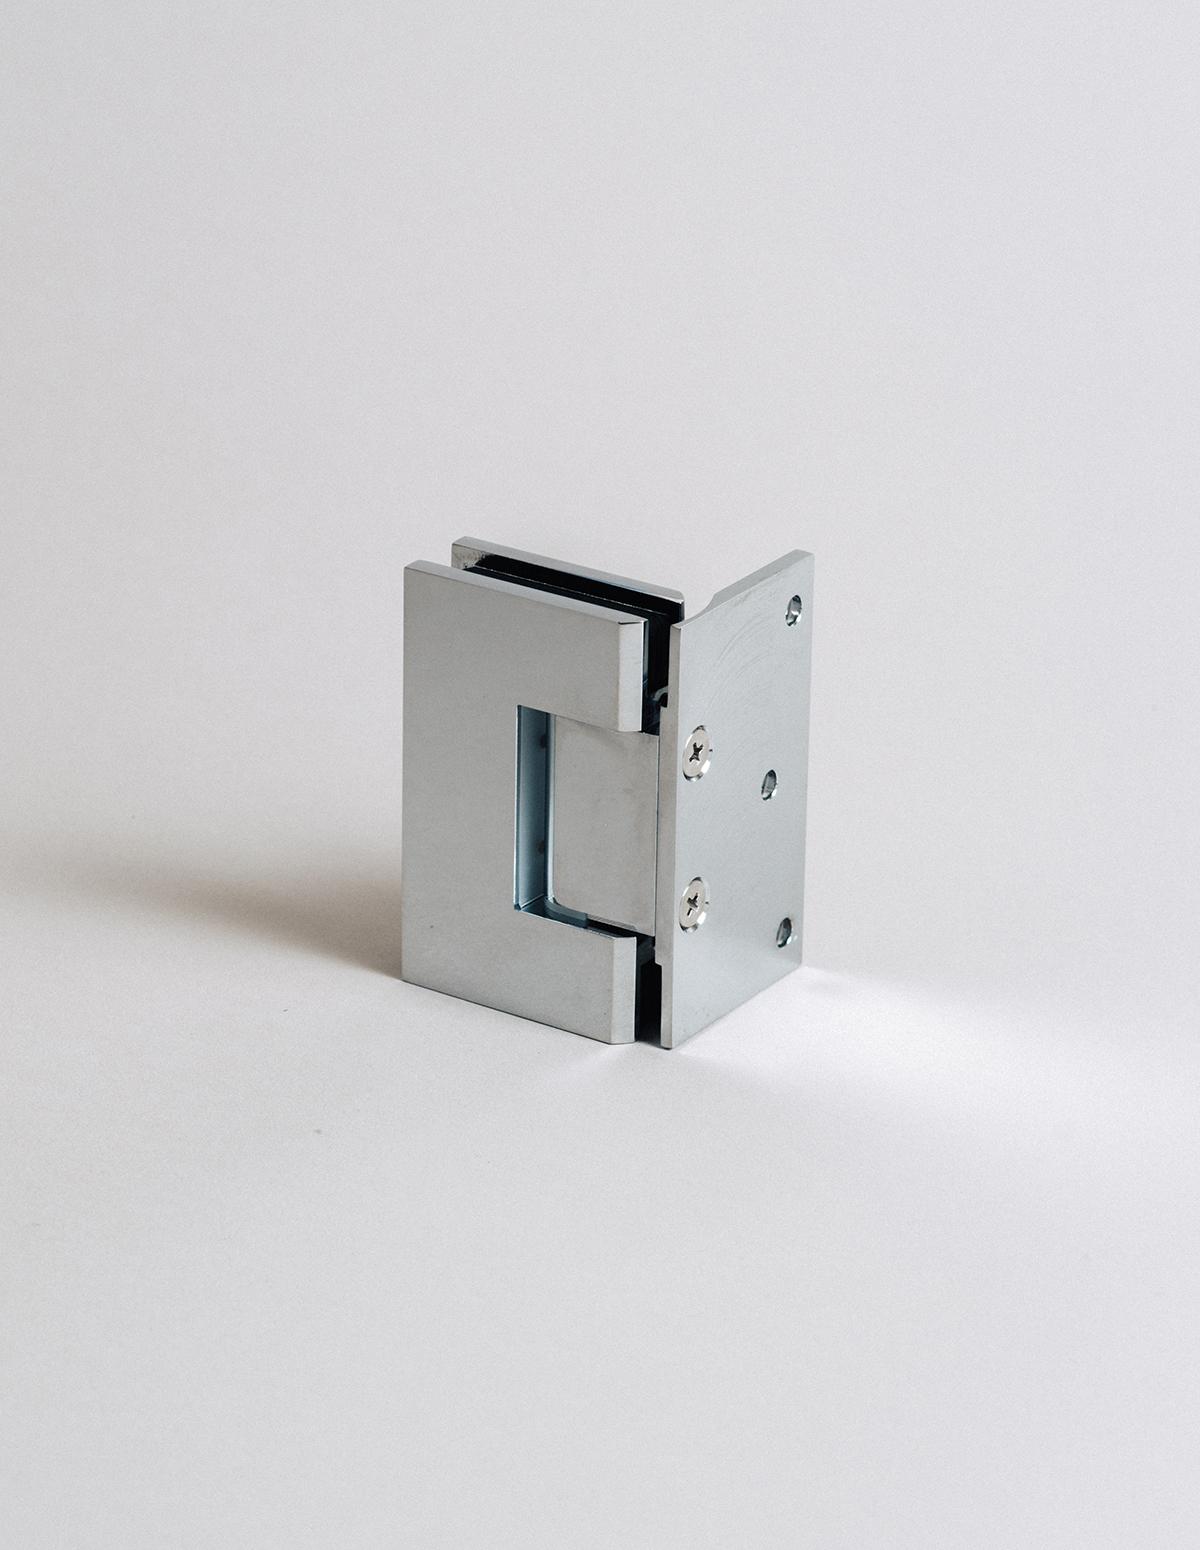 Optimum-Studios-Architectural-Glass-Metal-HardwarePage-Hinge3-042216